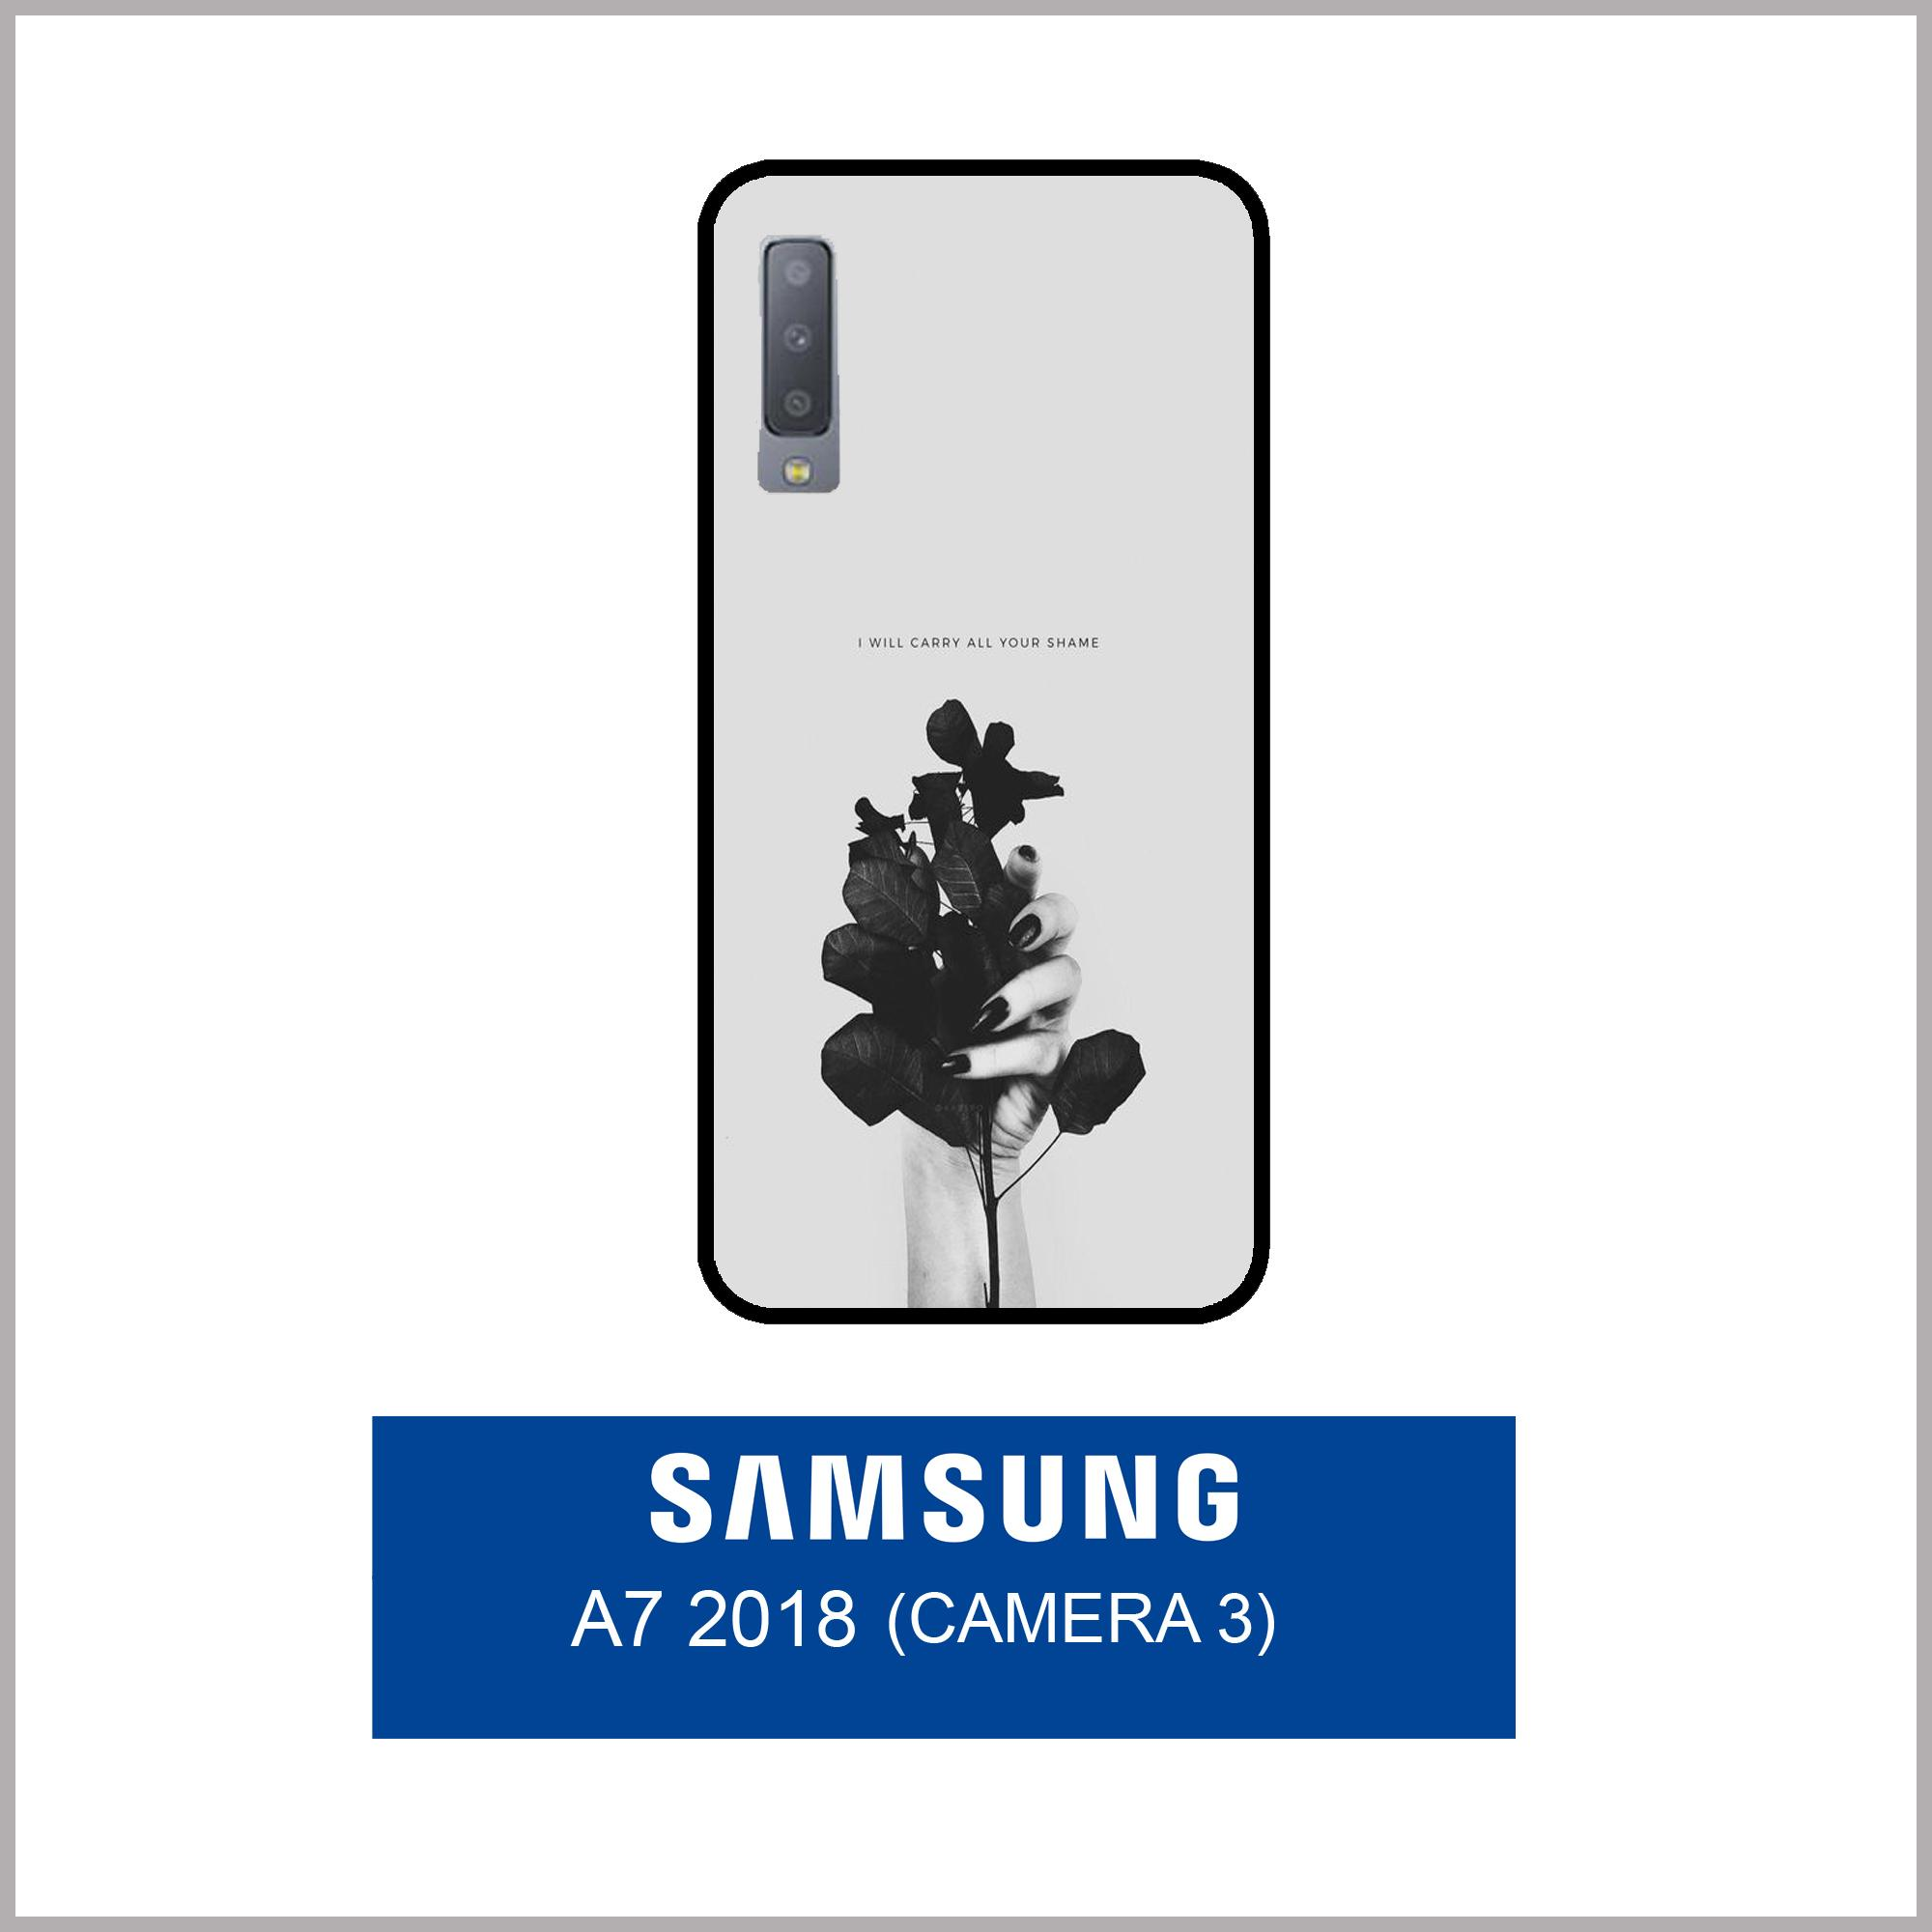 Rajamurah fasion printing case Samsung A7 2018 - 1 (camera 3)